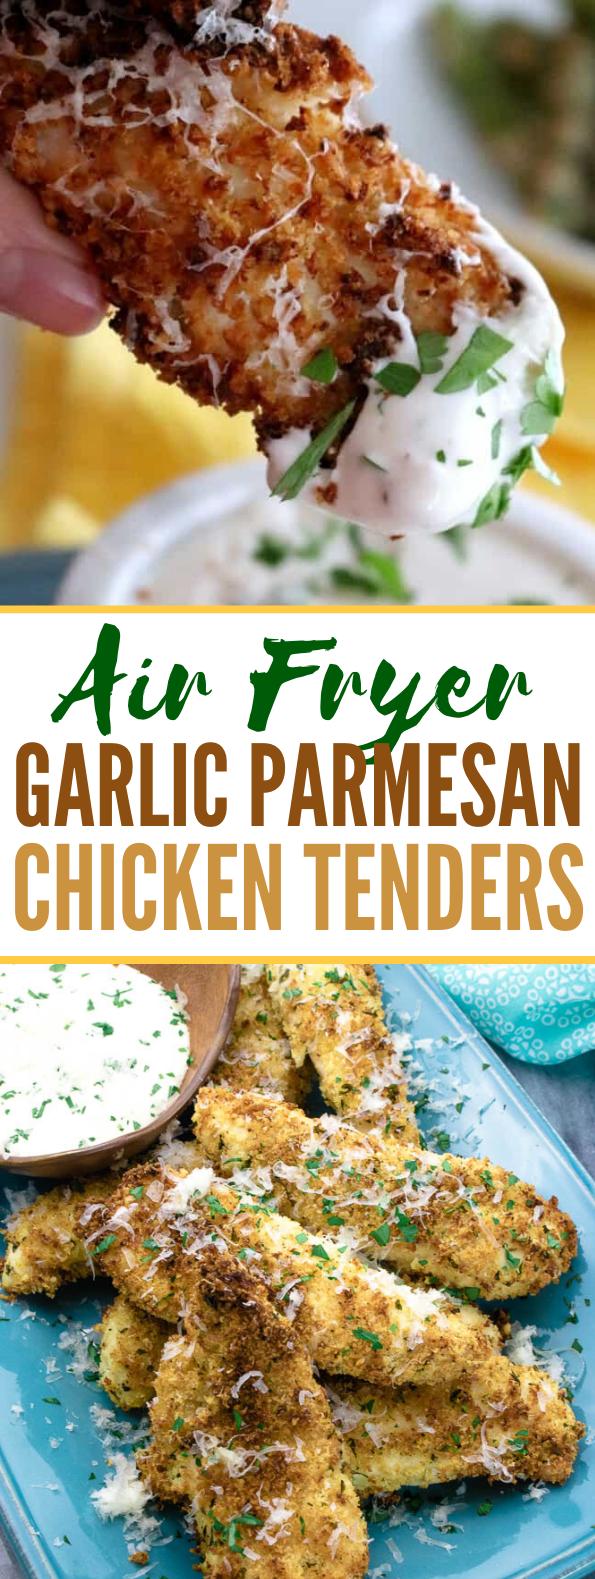 AIR FRYER GARLIC PARMESAN CHICKEN TENDER RECIPE #comfortfood #meals